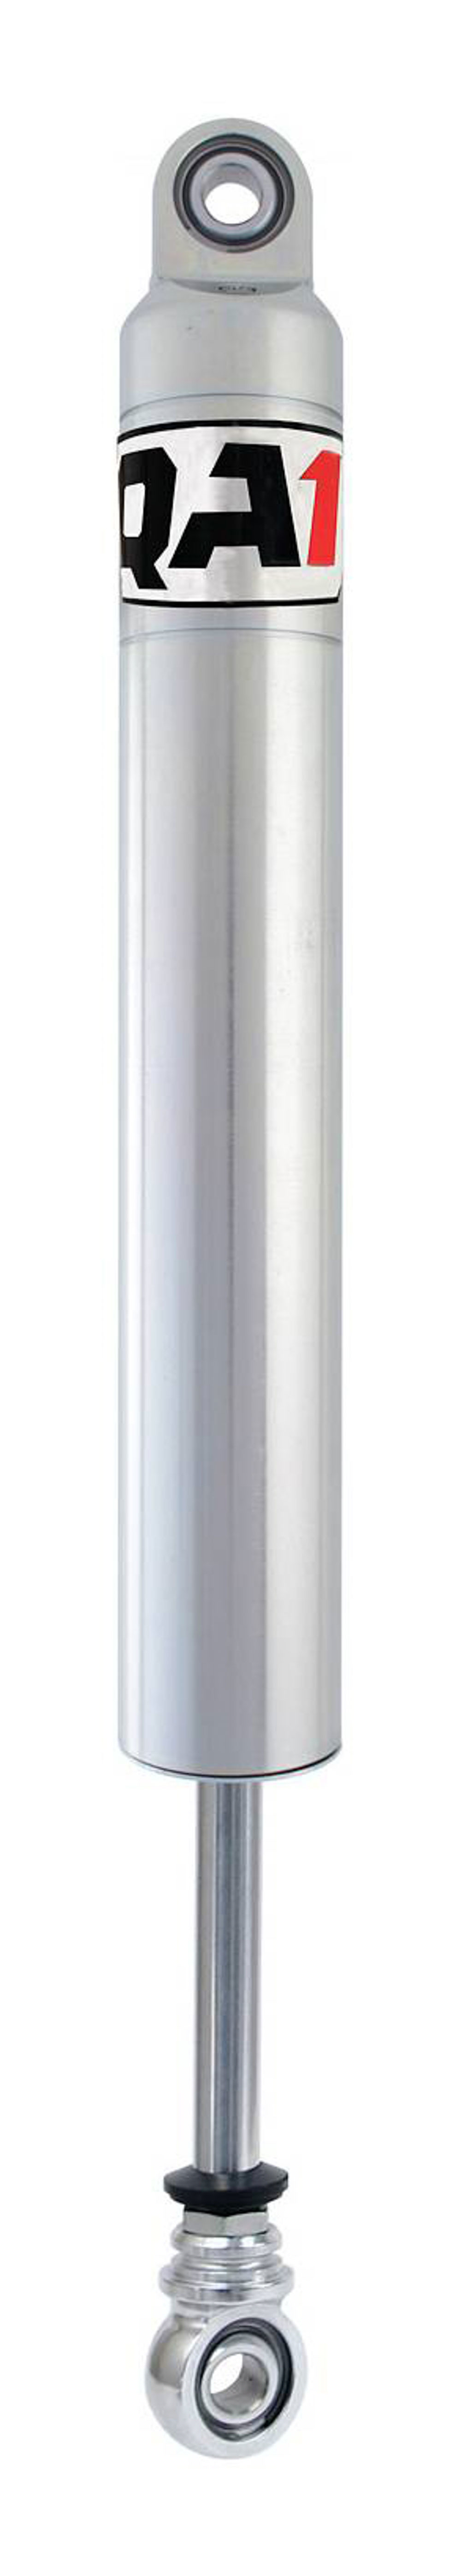 Qa1 Steel Shock - Monotube 7in 3C-7R Digressive